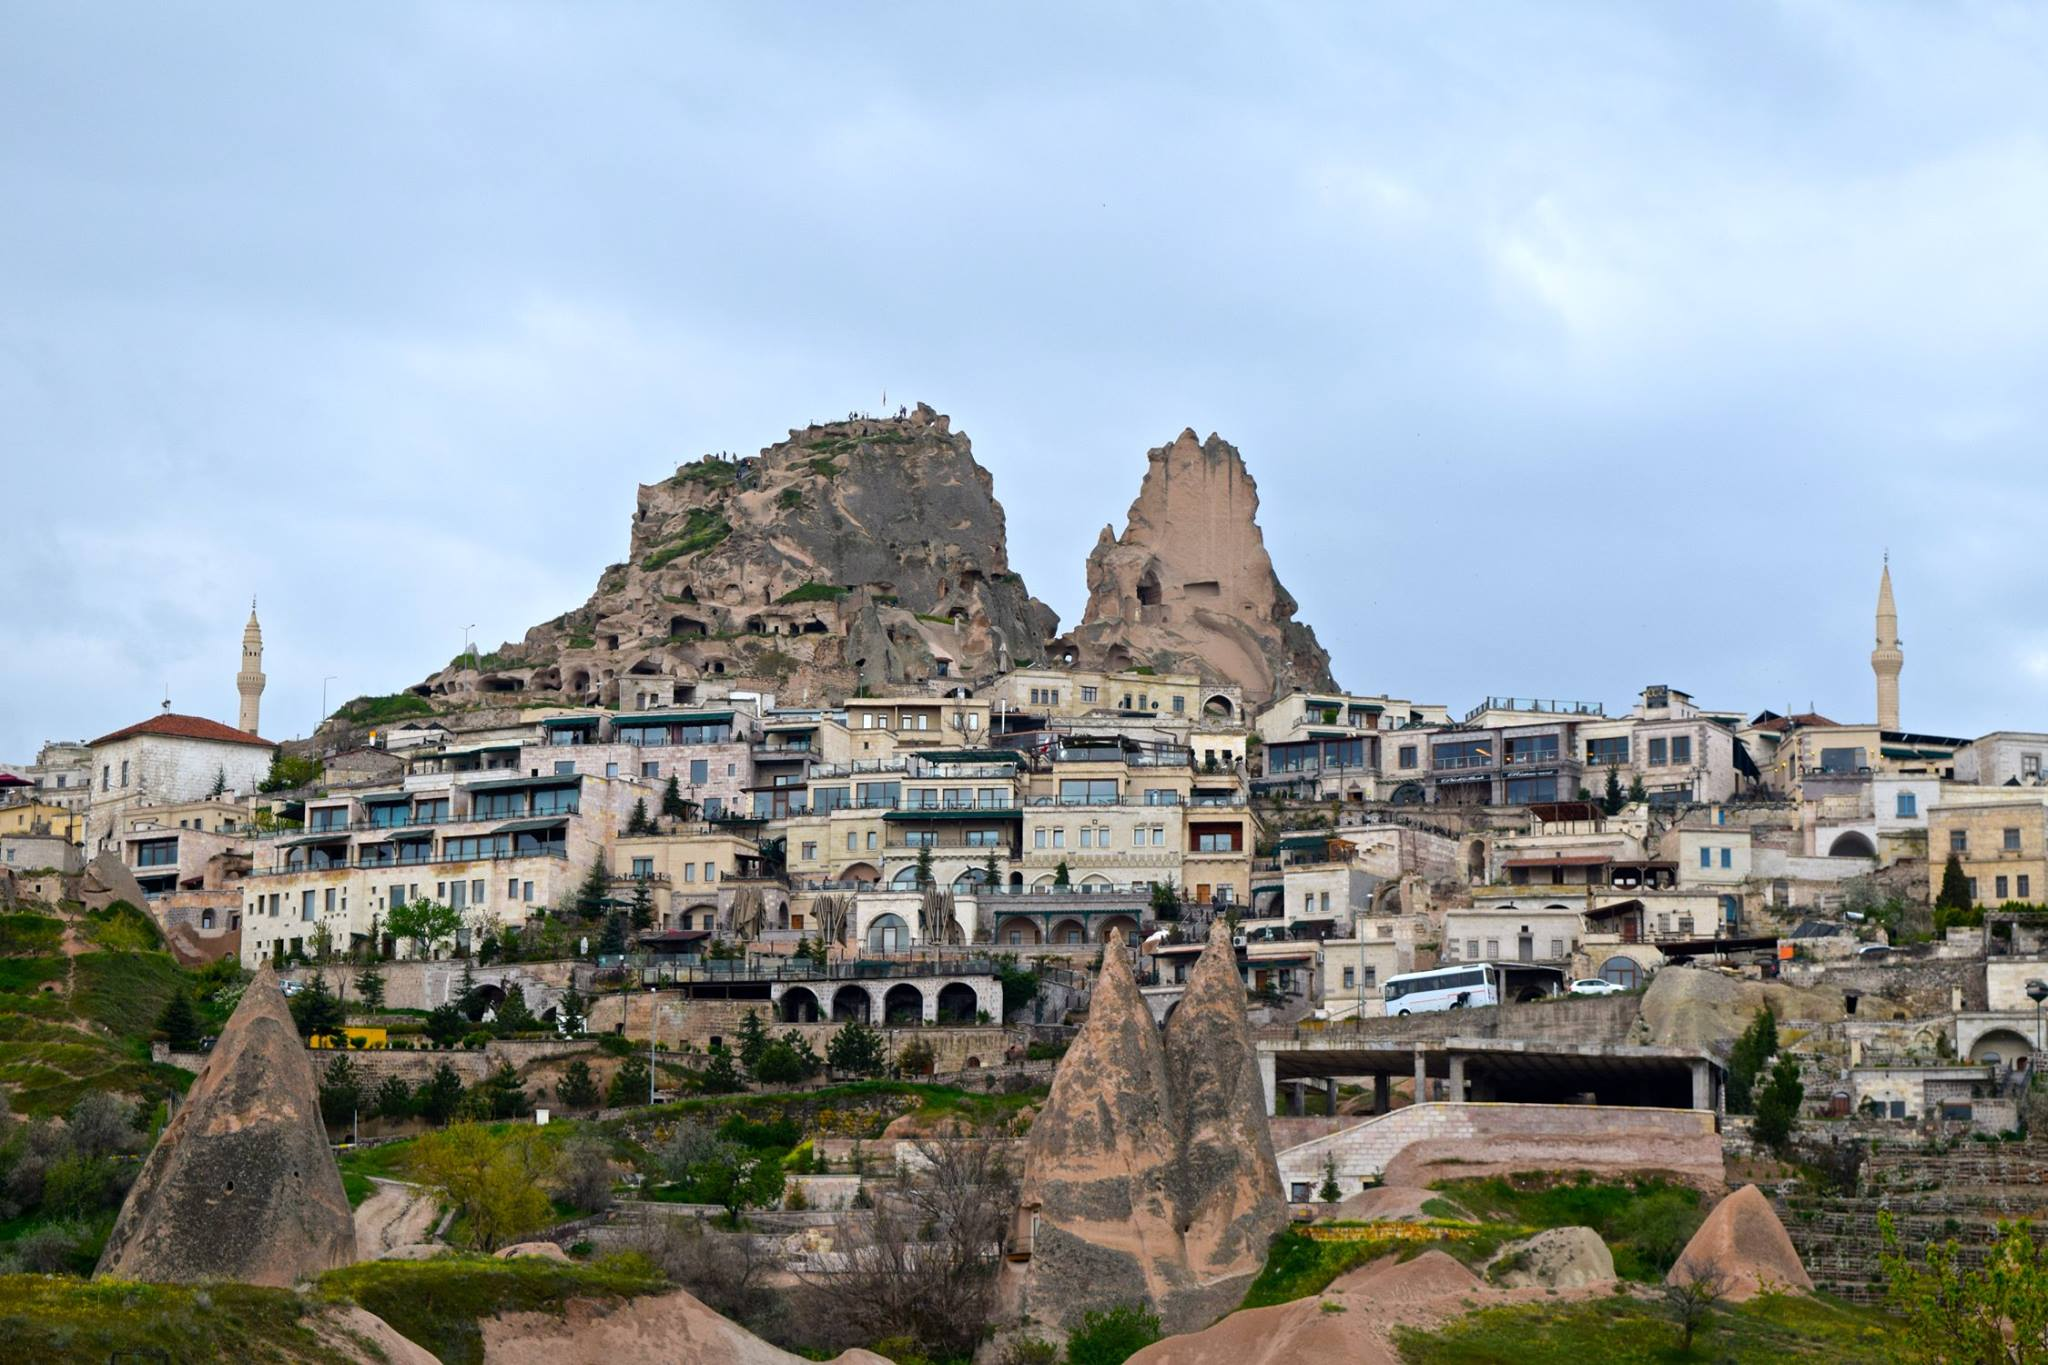 Pigeon Valley in Uçhisar, Cappadocia